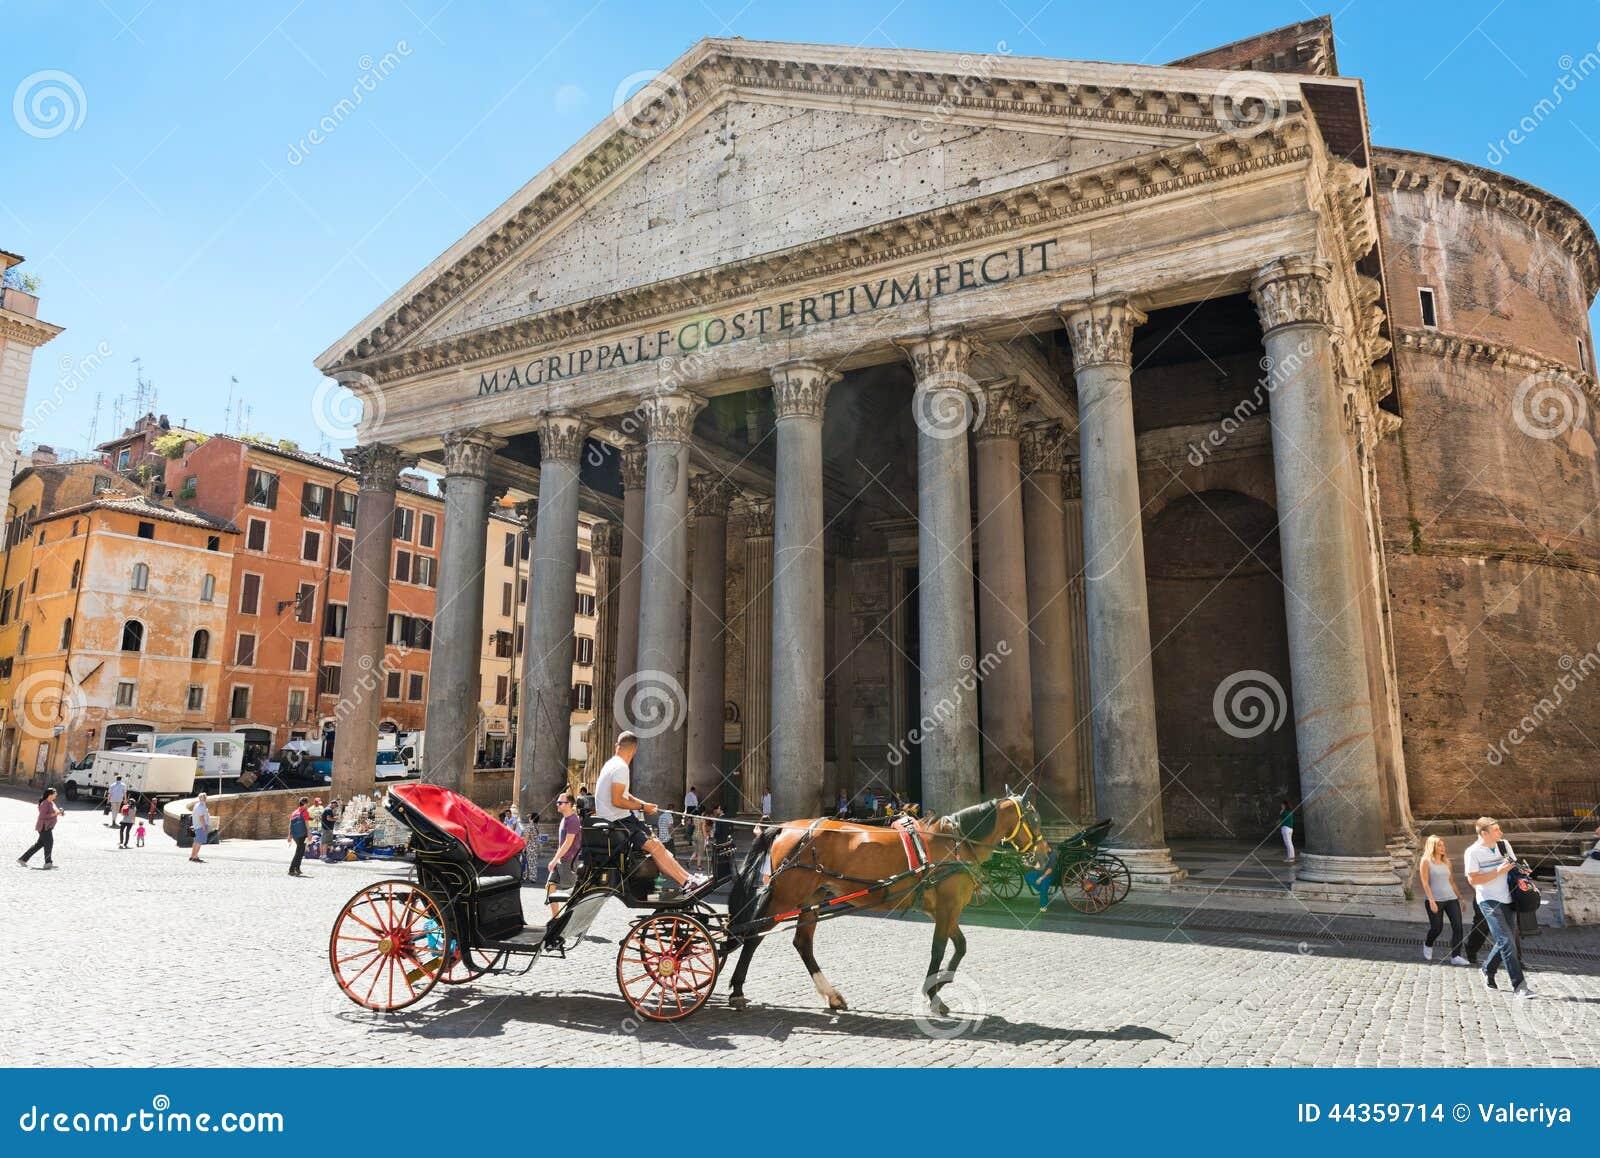 Una carrozza a cavalli davanti al panteon a Roma, Italia roma